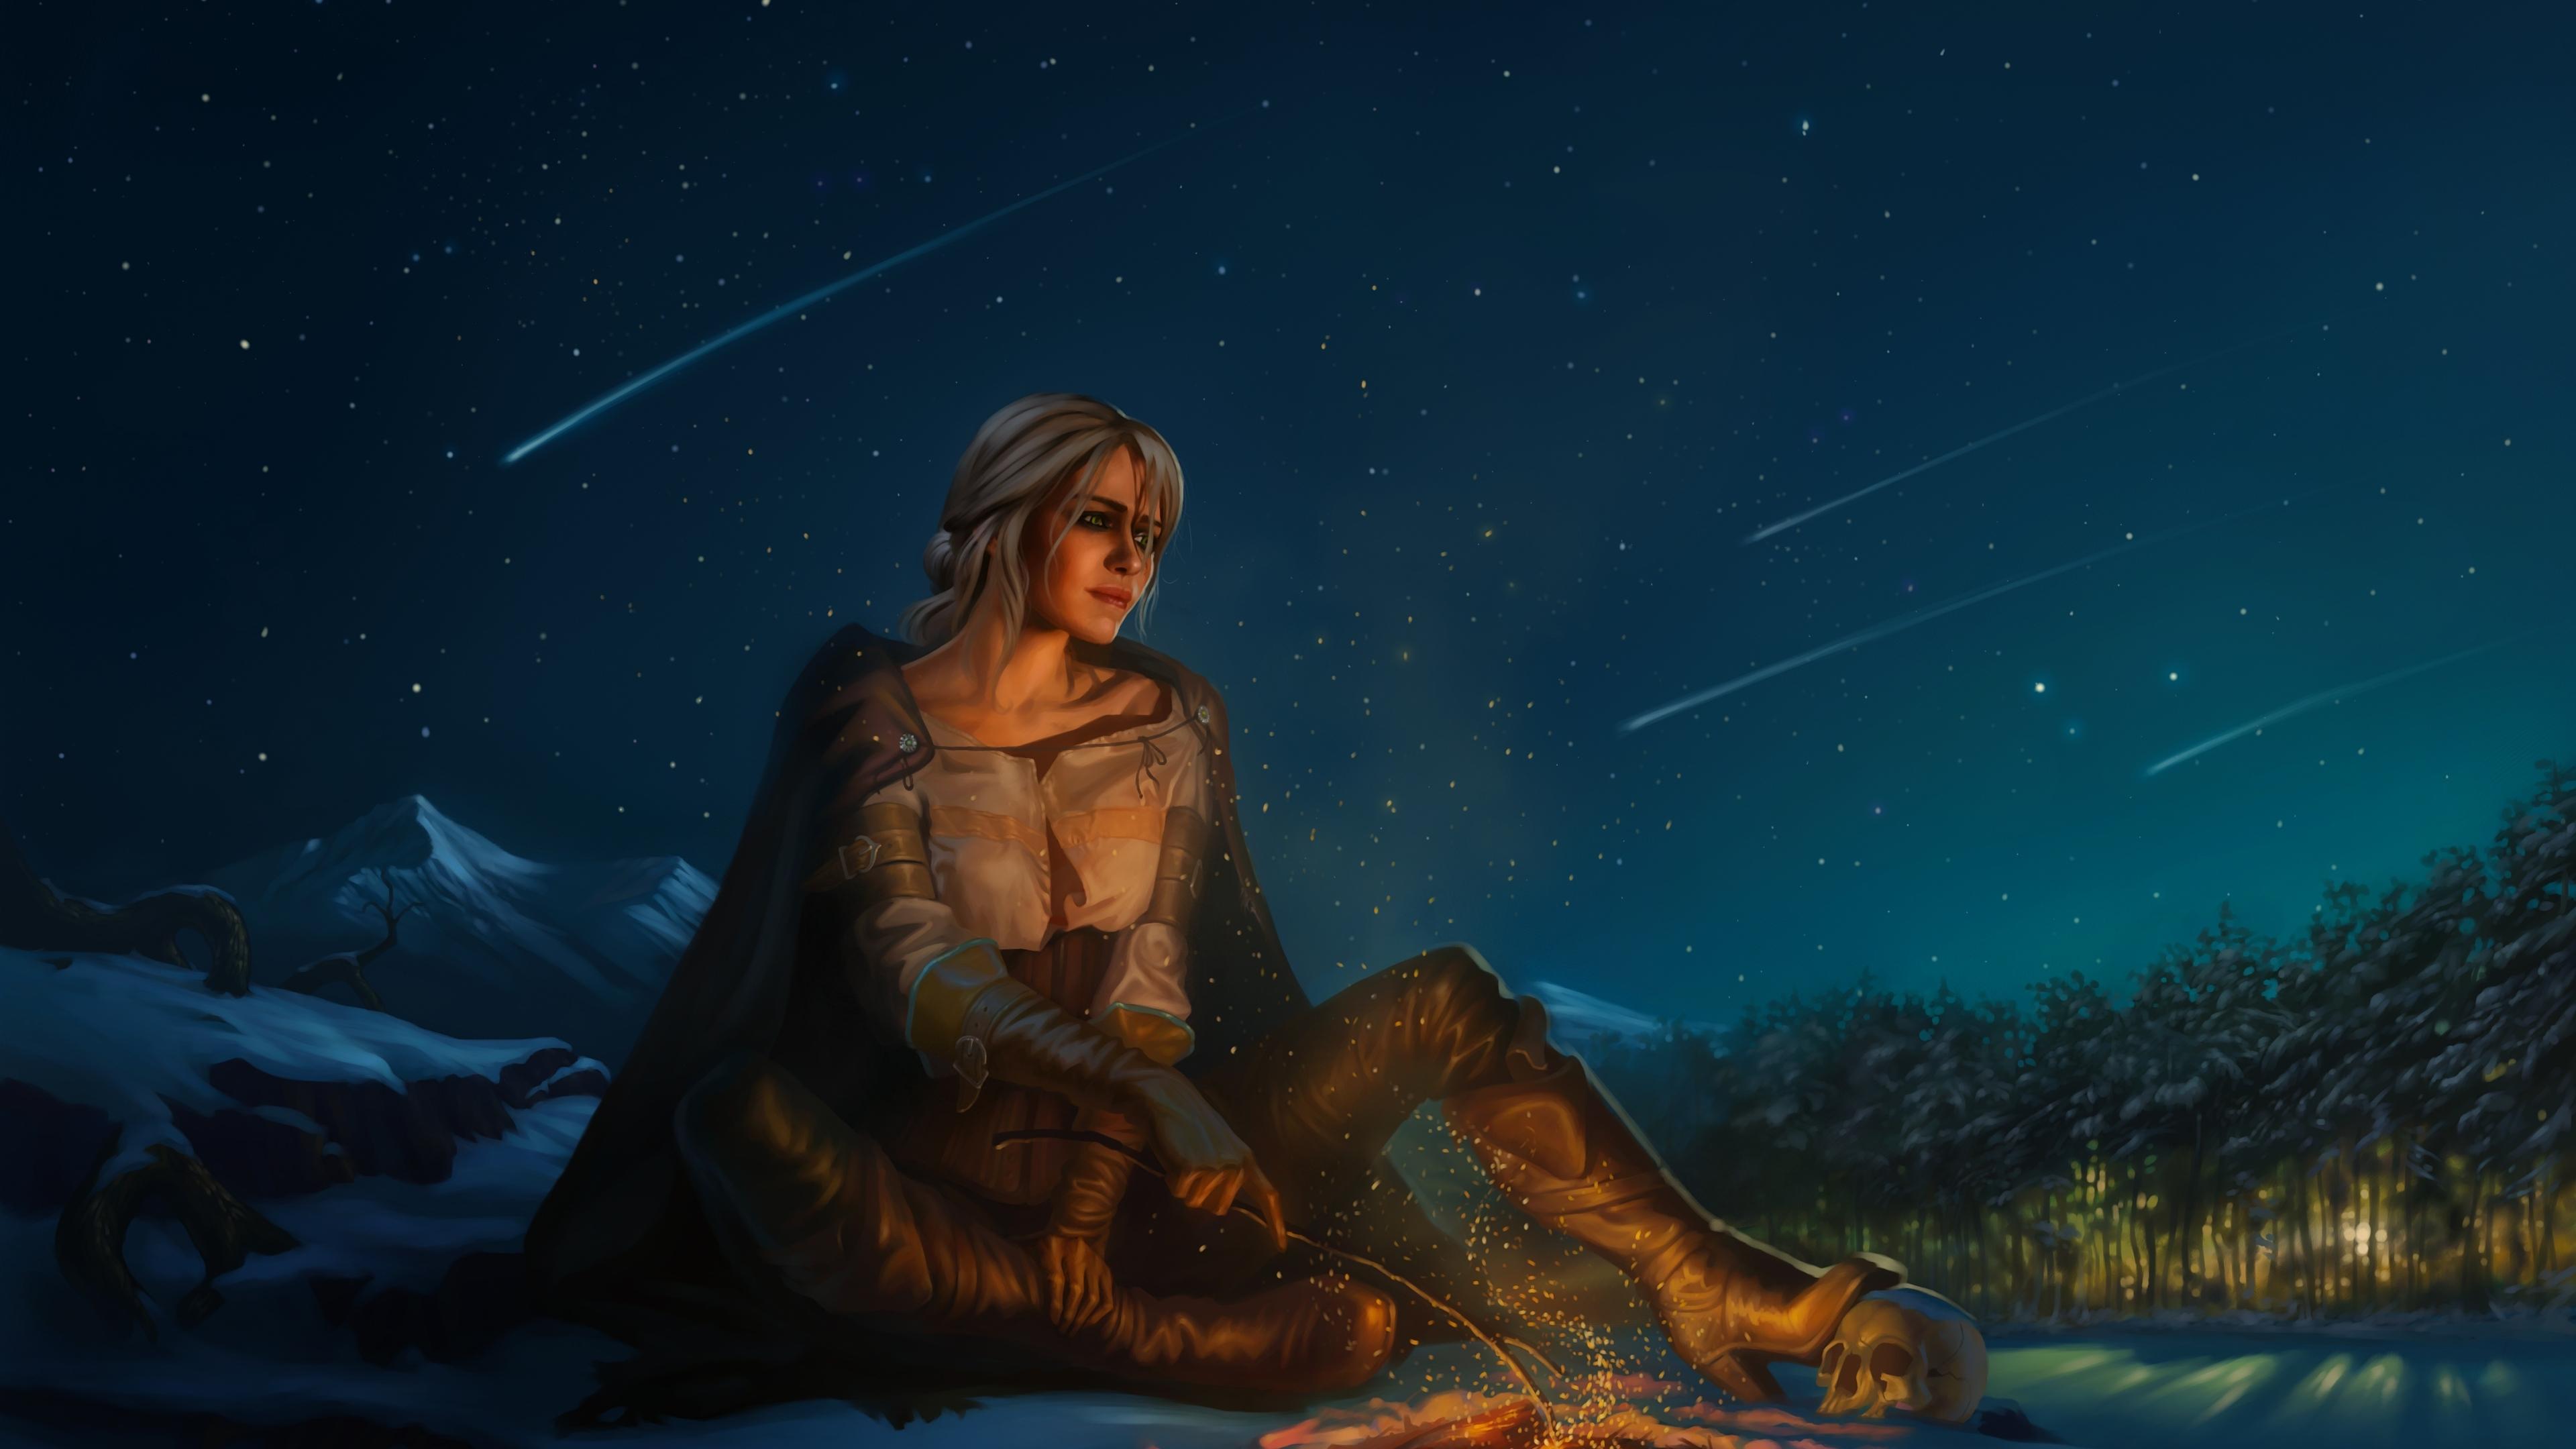 3840x2160 Ciri The Witcher 3 Wild Hunt 4k Wallpaper Hd Games 4k